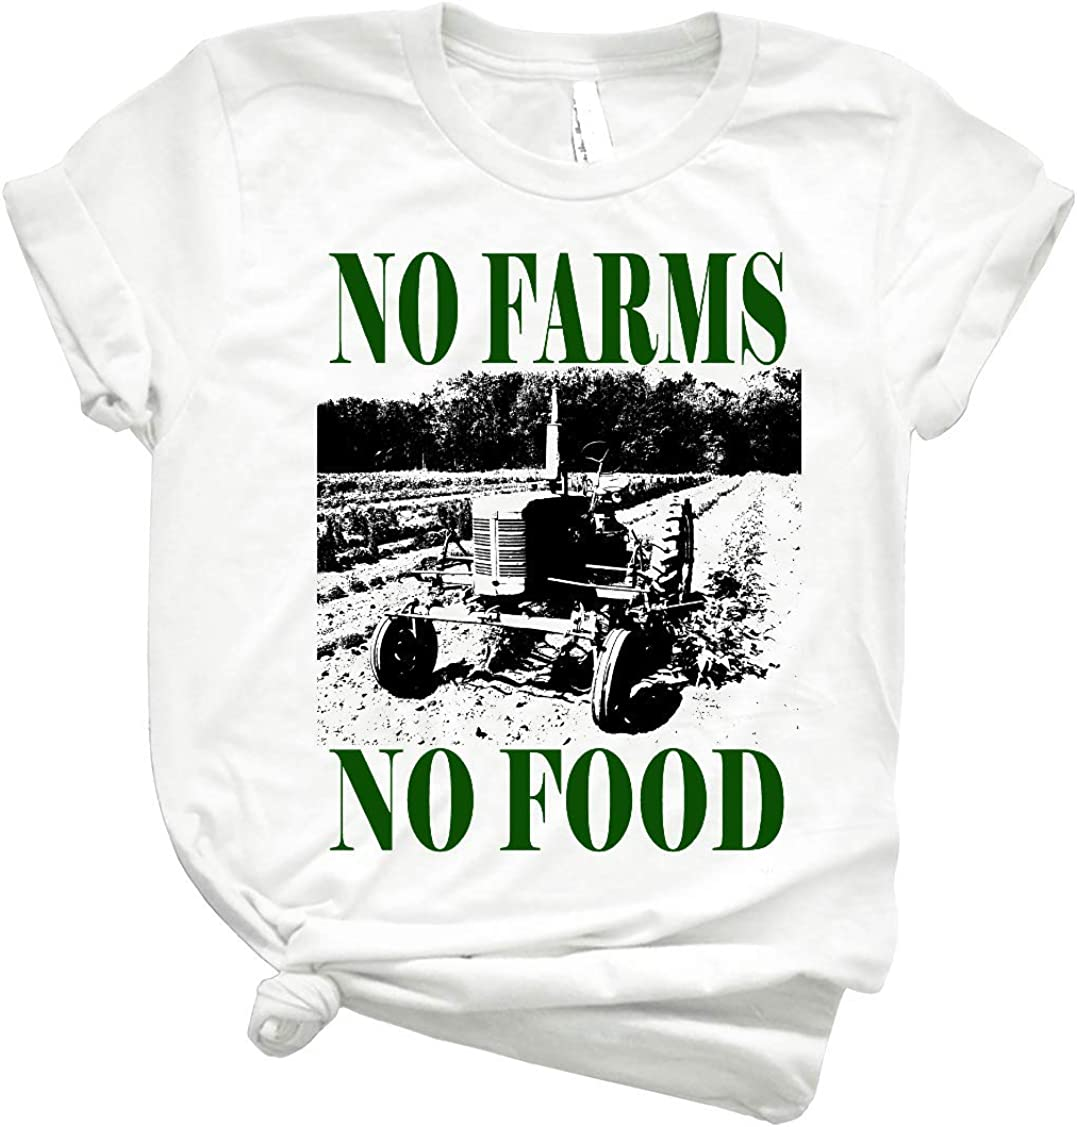 No Farms No Food 75 GraphicRetroShirtsforWomen - Best Retro Graphic T Shirts - CuteTShirtsGraphic